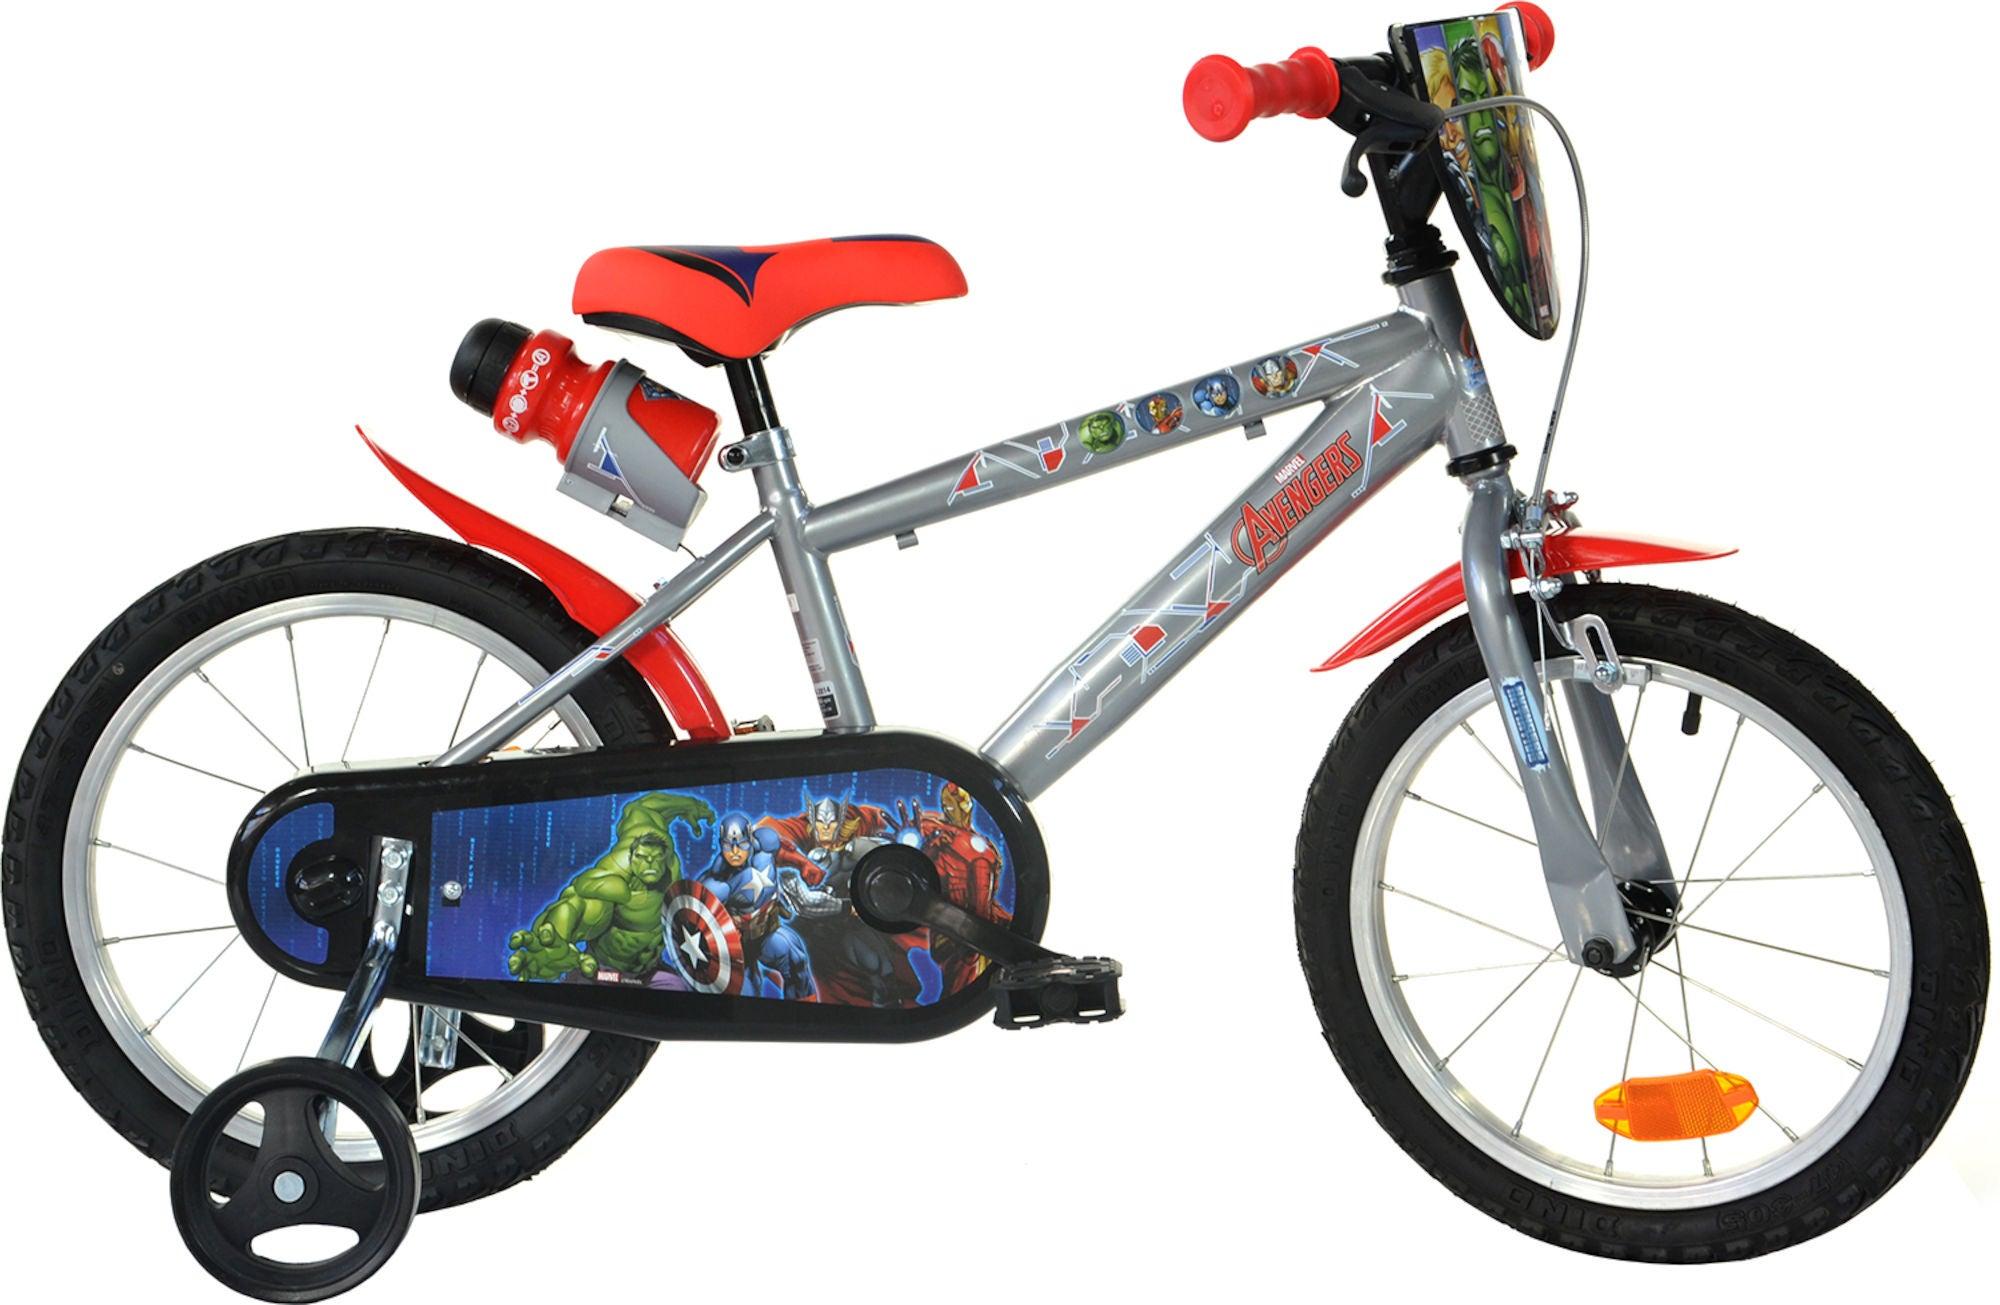 Køb Marvel Avengers Cykel 16 Tommer, Metallic Grå | City